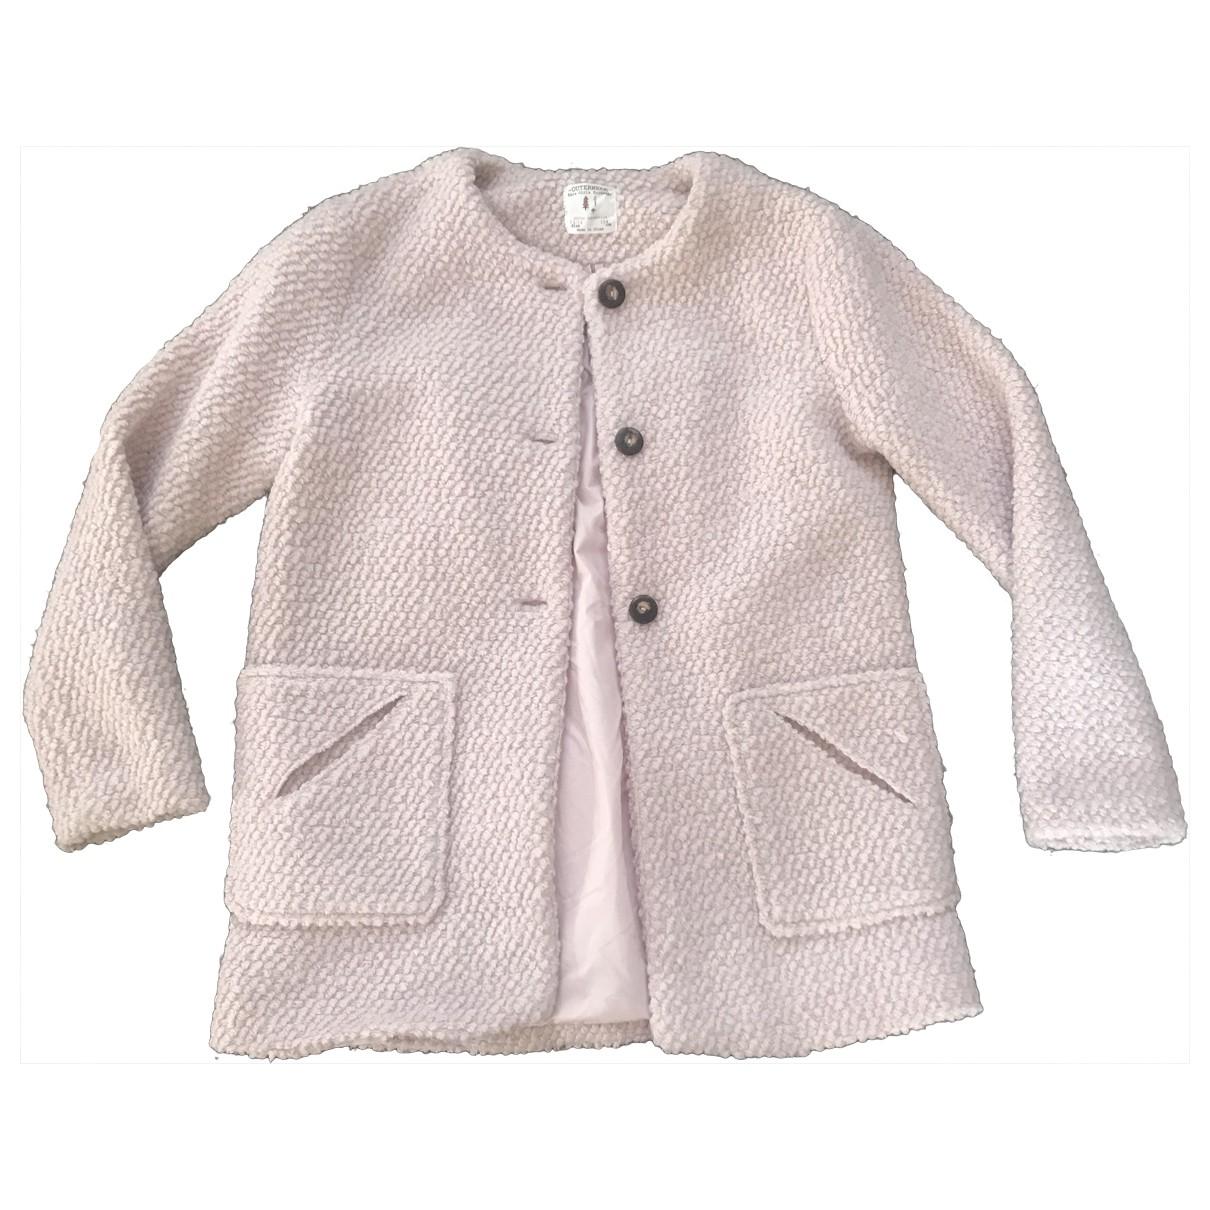 Zara \N Pink Wool jacket & coat for Kids 12 years - XS UK